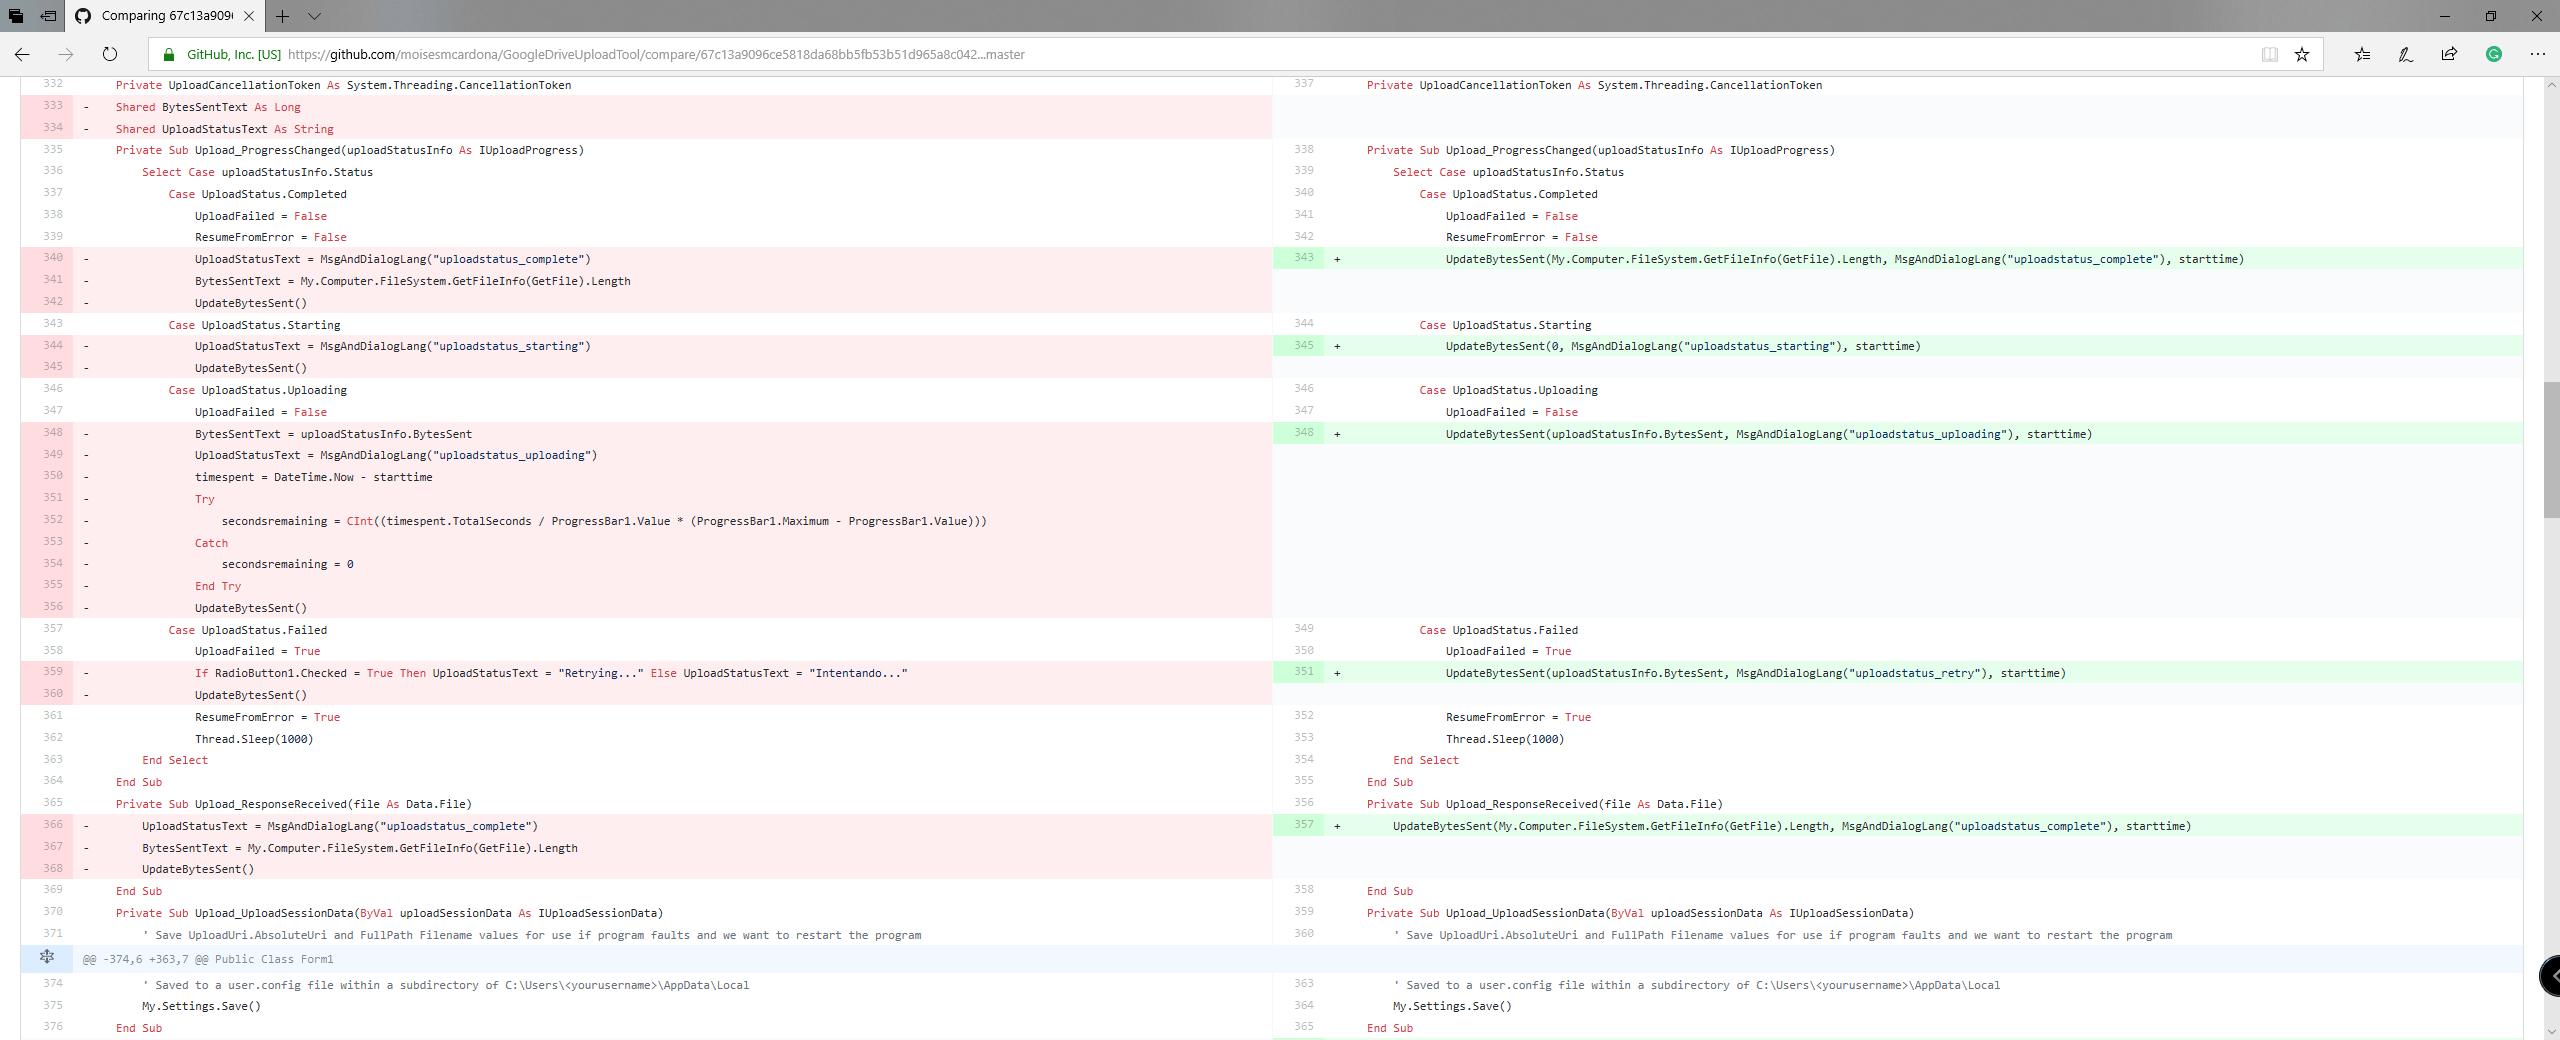 Google Drive Upload Tool v1.8.3 - 2